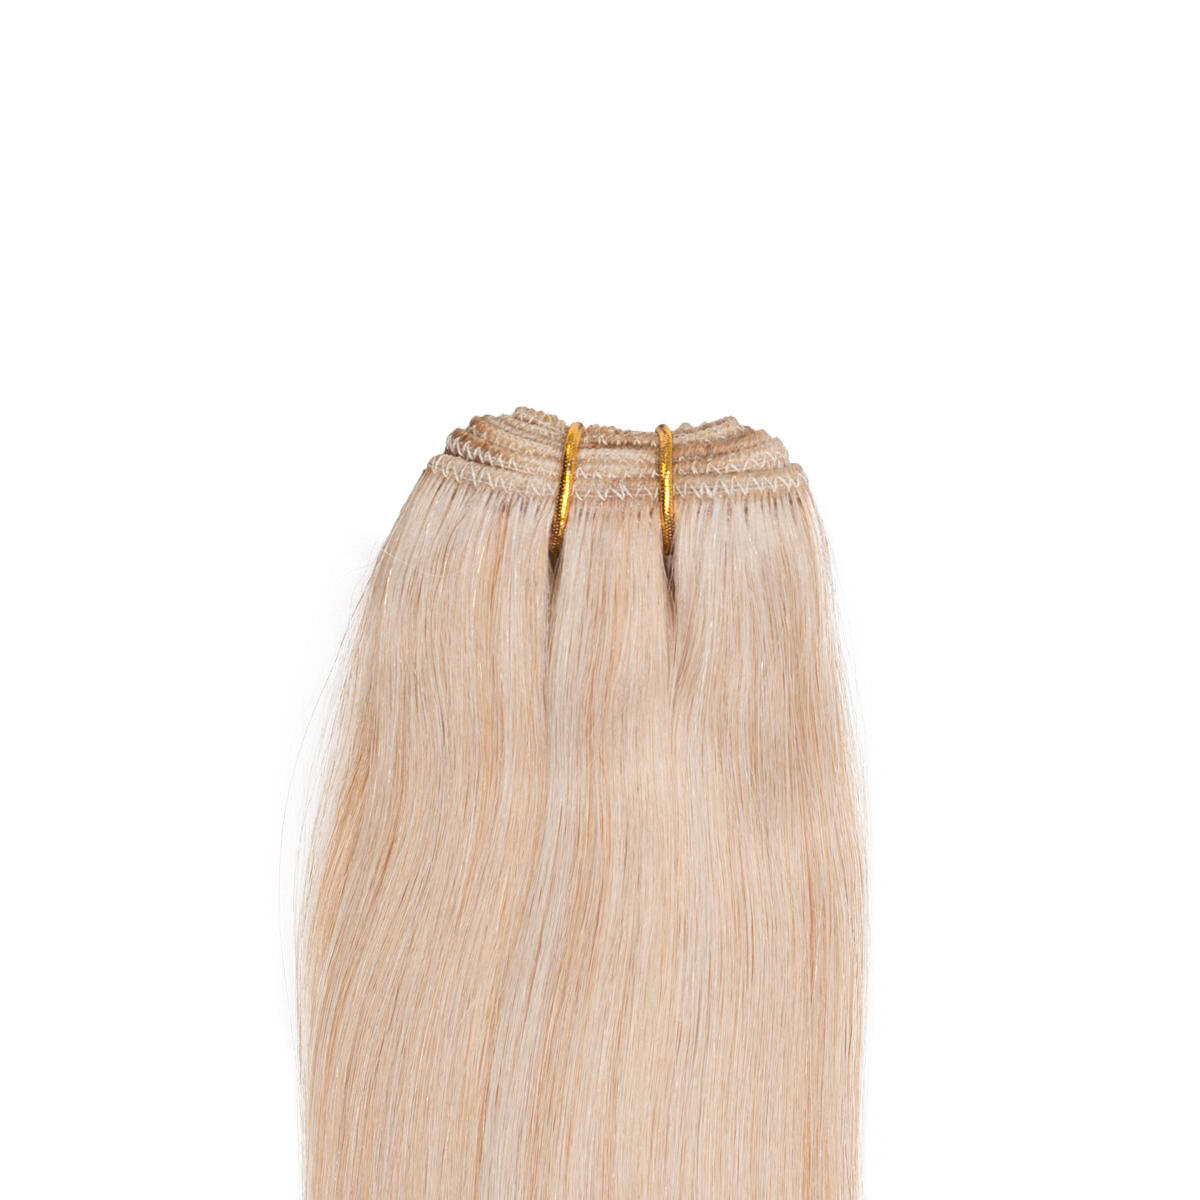 Hair Weft Premium M7.5/10.8 Scandinavian Blonde Mix 50 cm